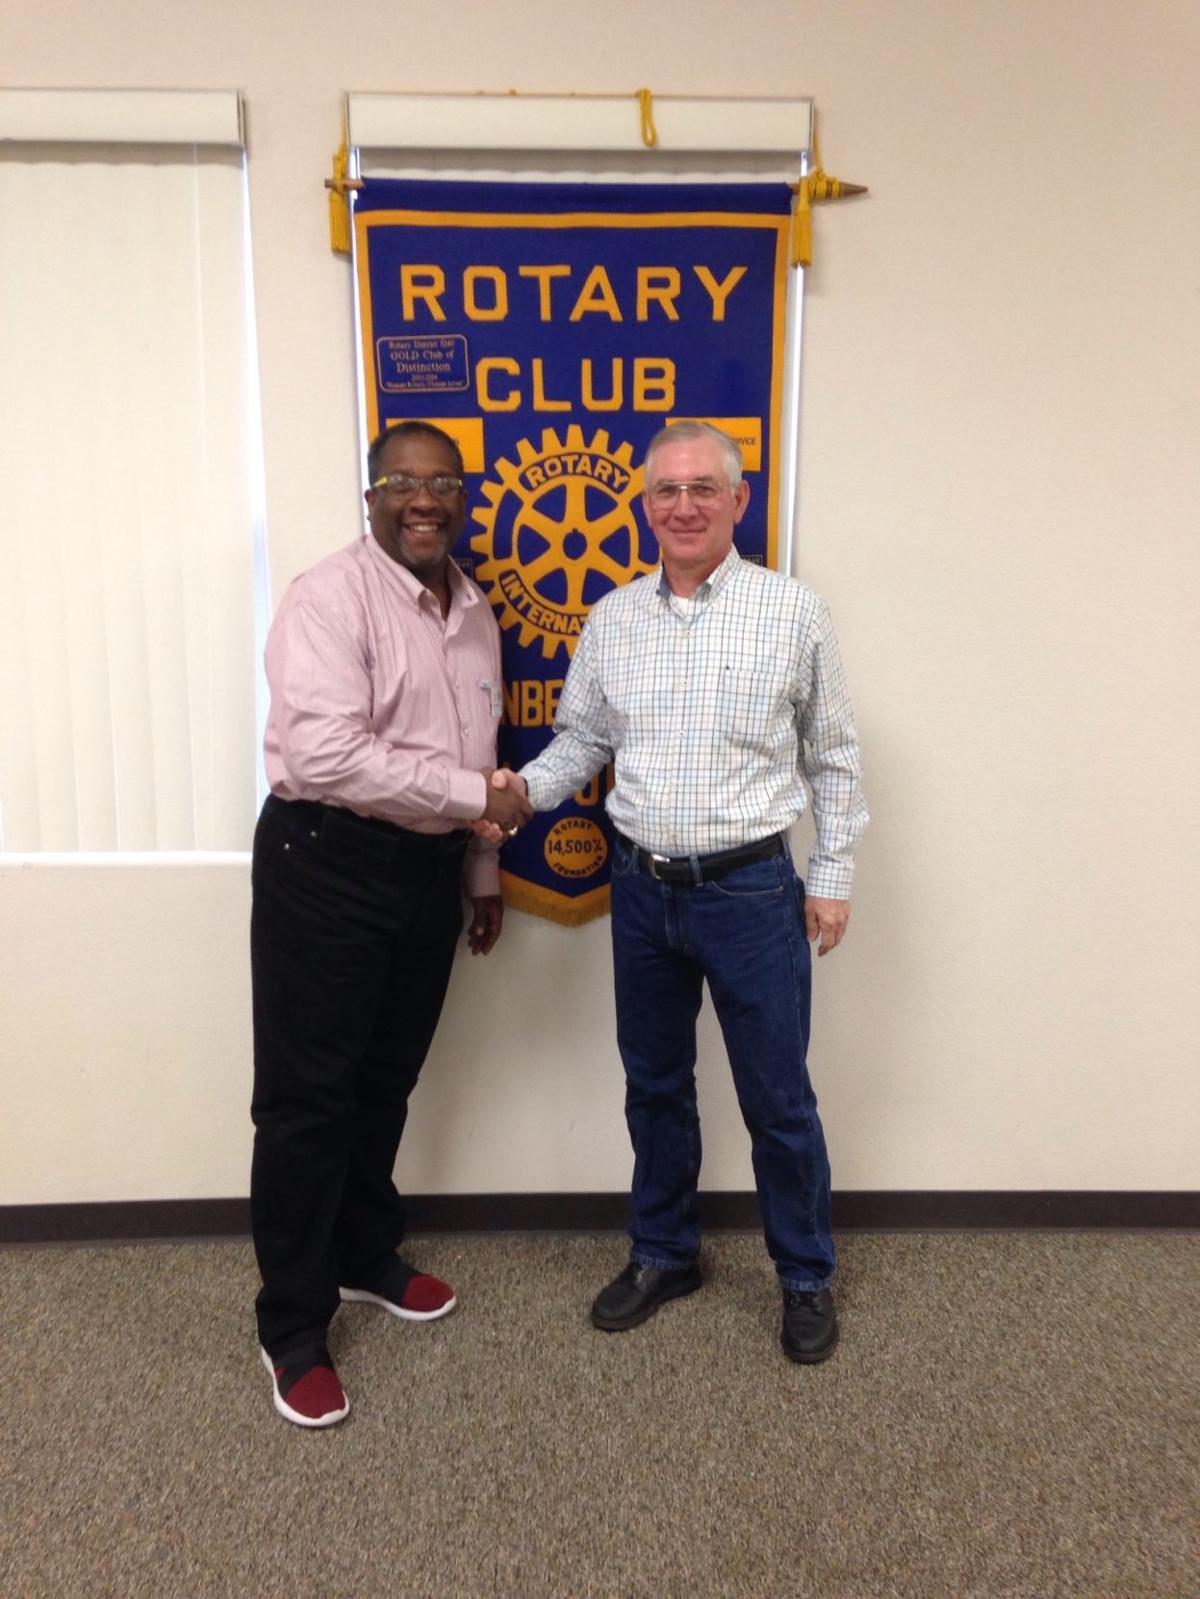 Vandenberg Village Association president speaks to Rotary Club